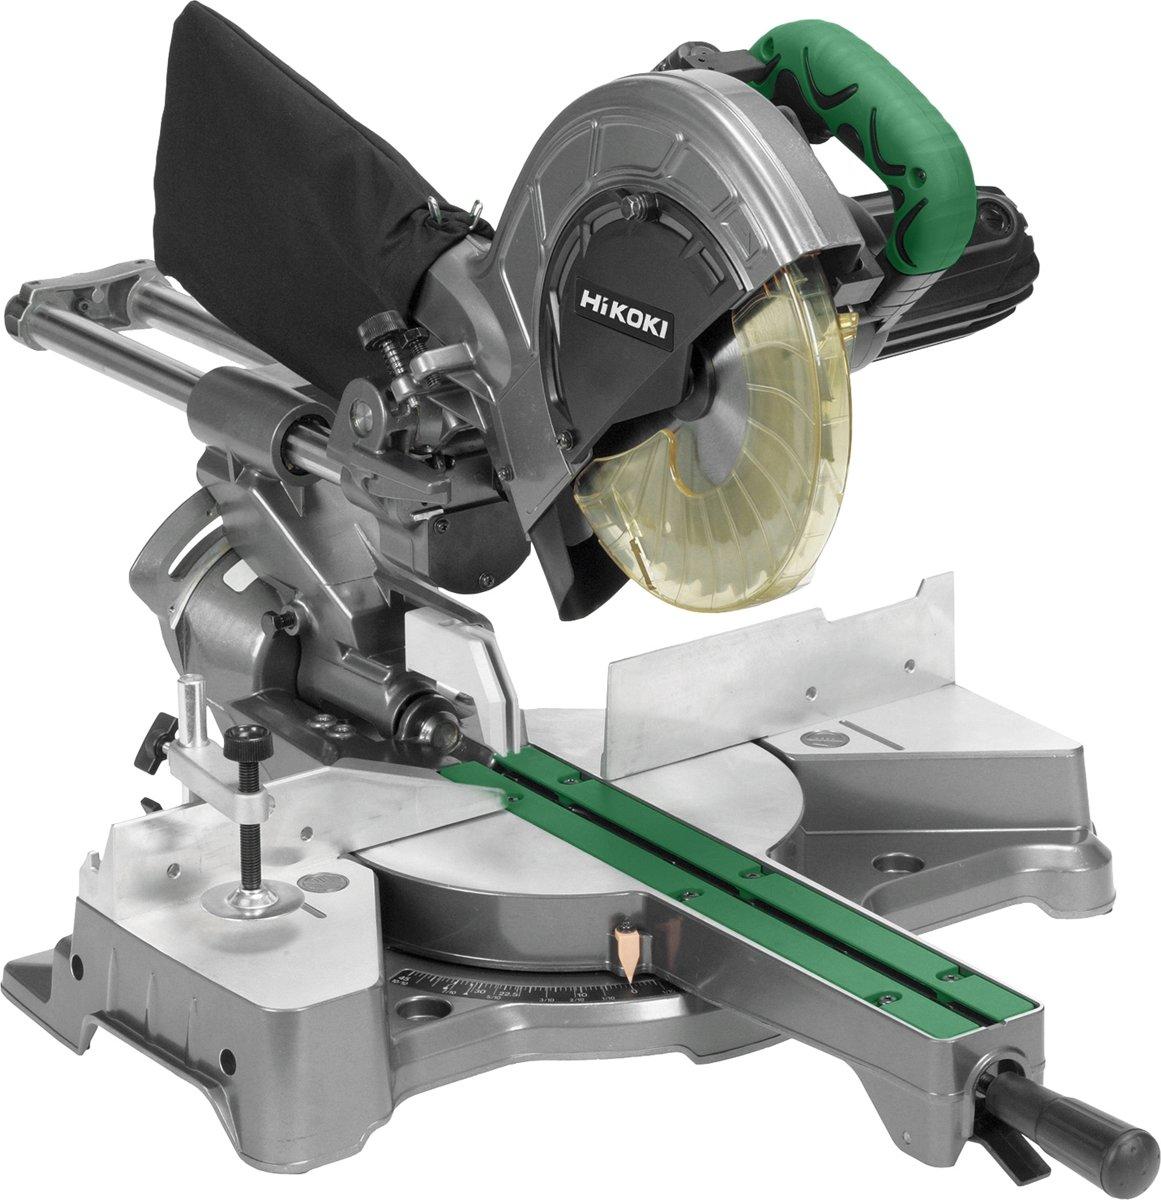 HiKOKI afkort-verstekzaagmachine - C8FSEUAZ - 216 mm zaagblad - 1050 W